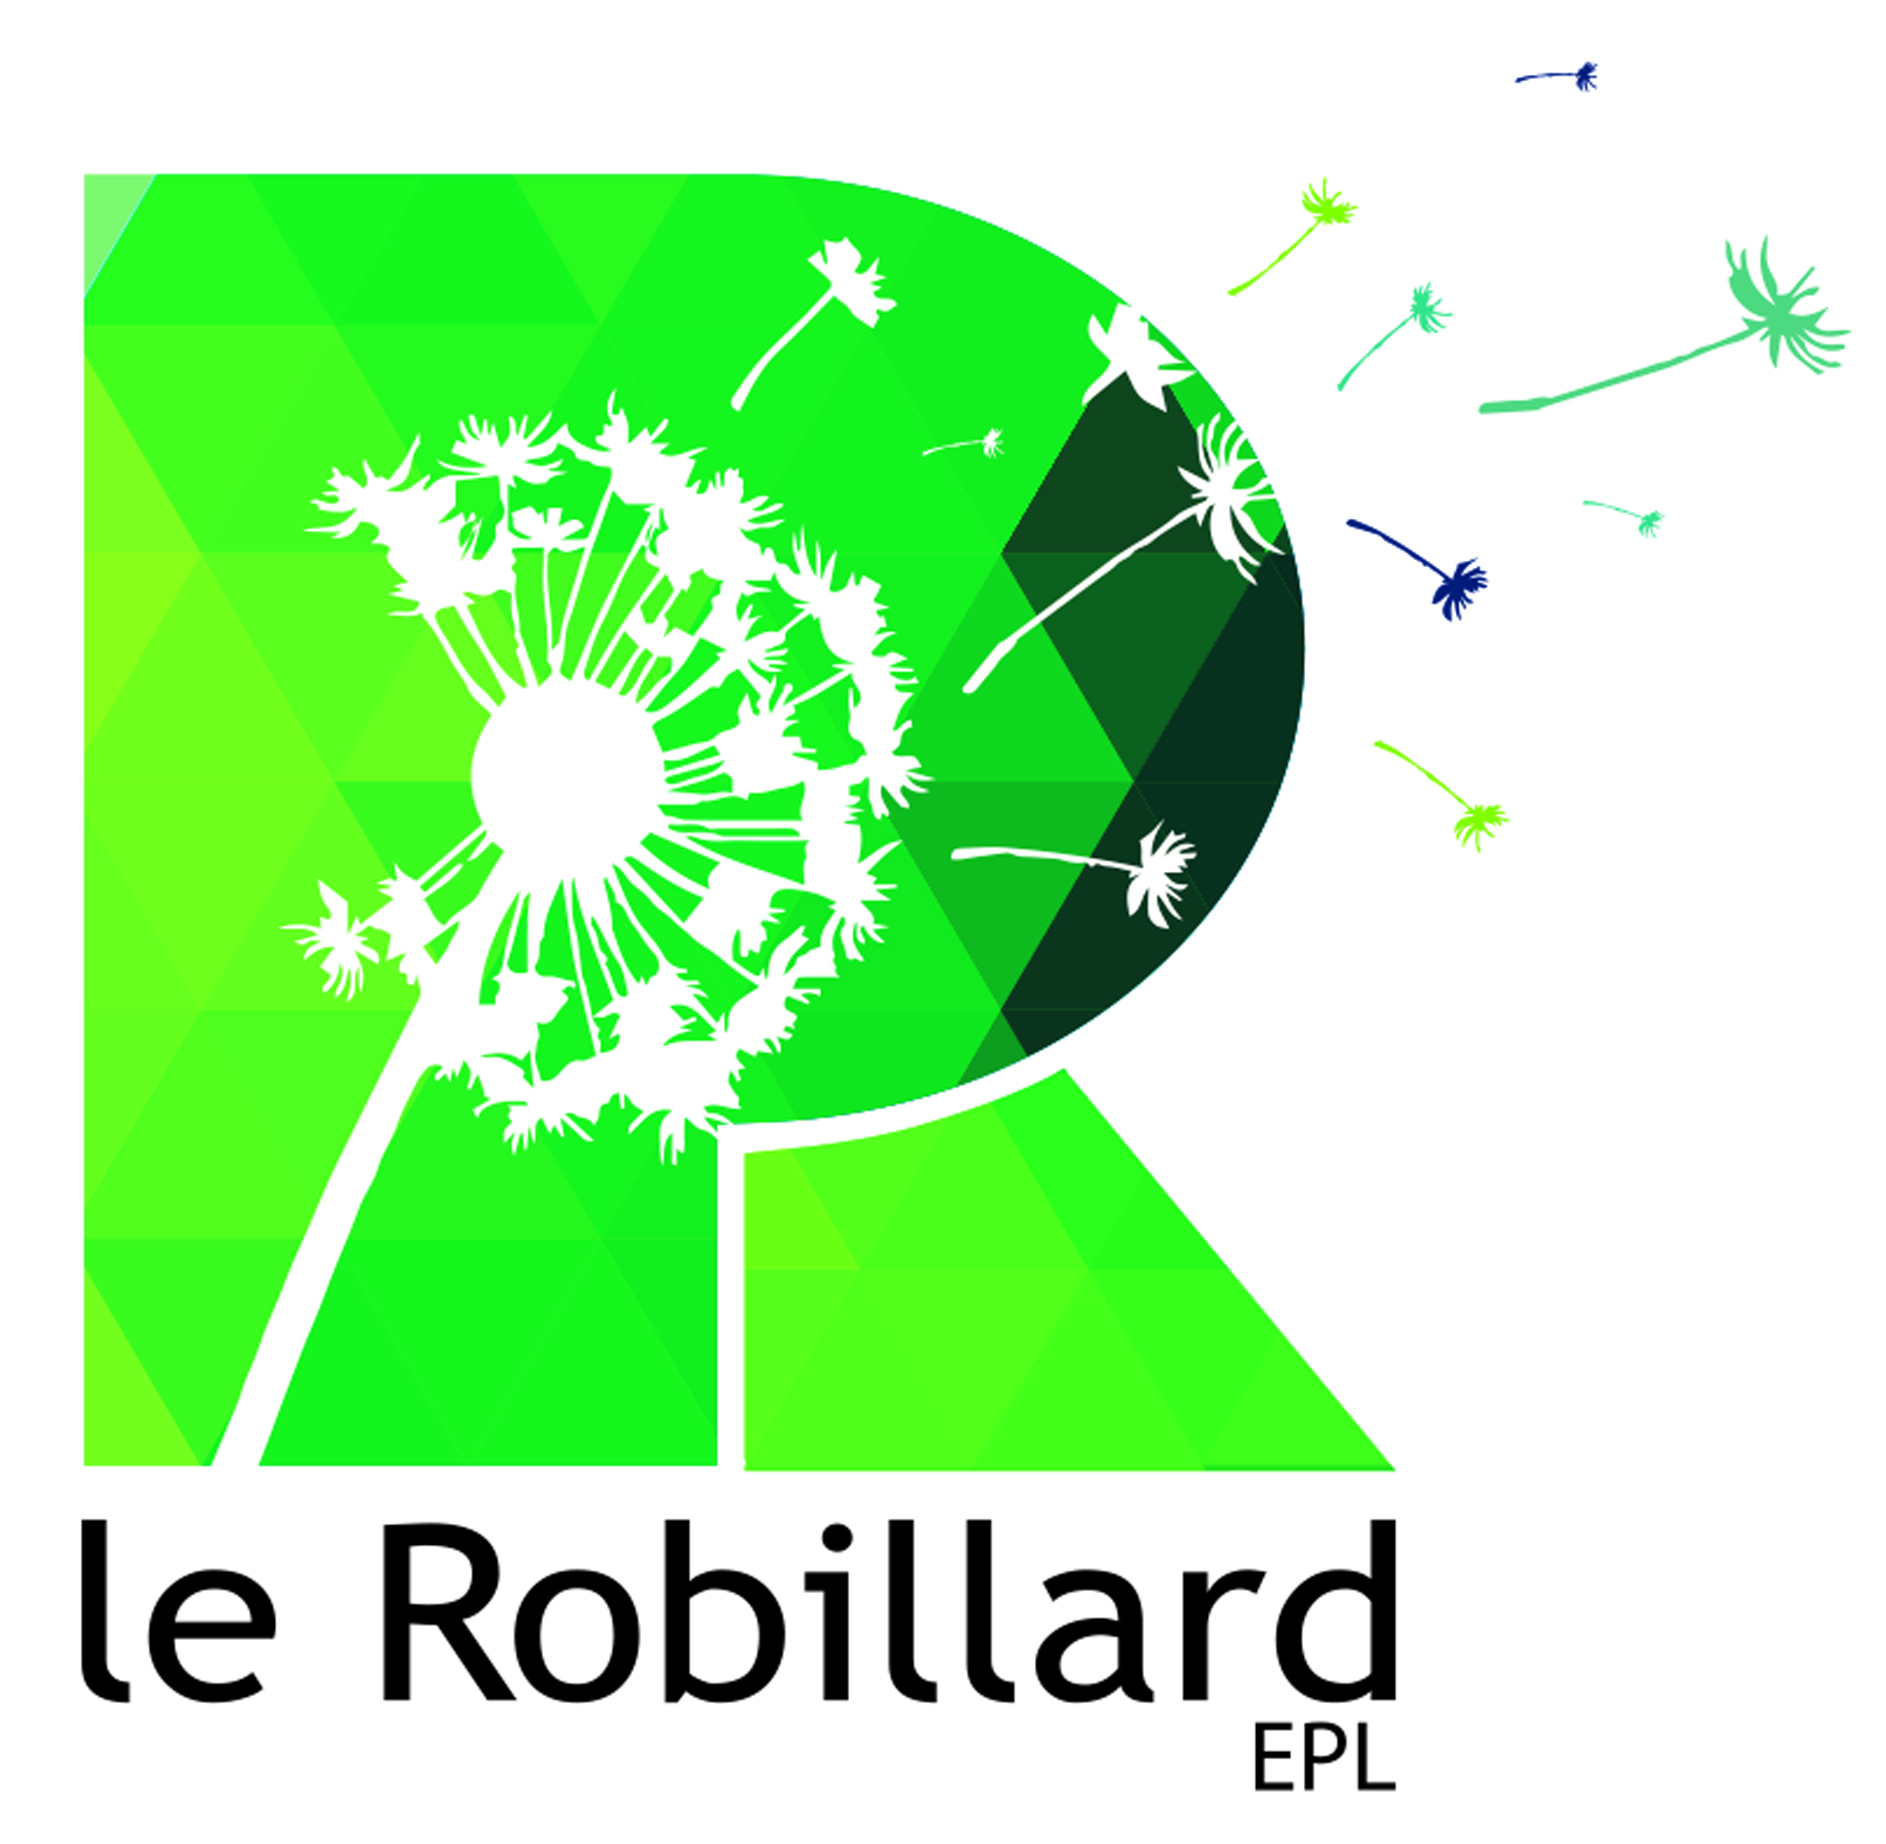 robillard